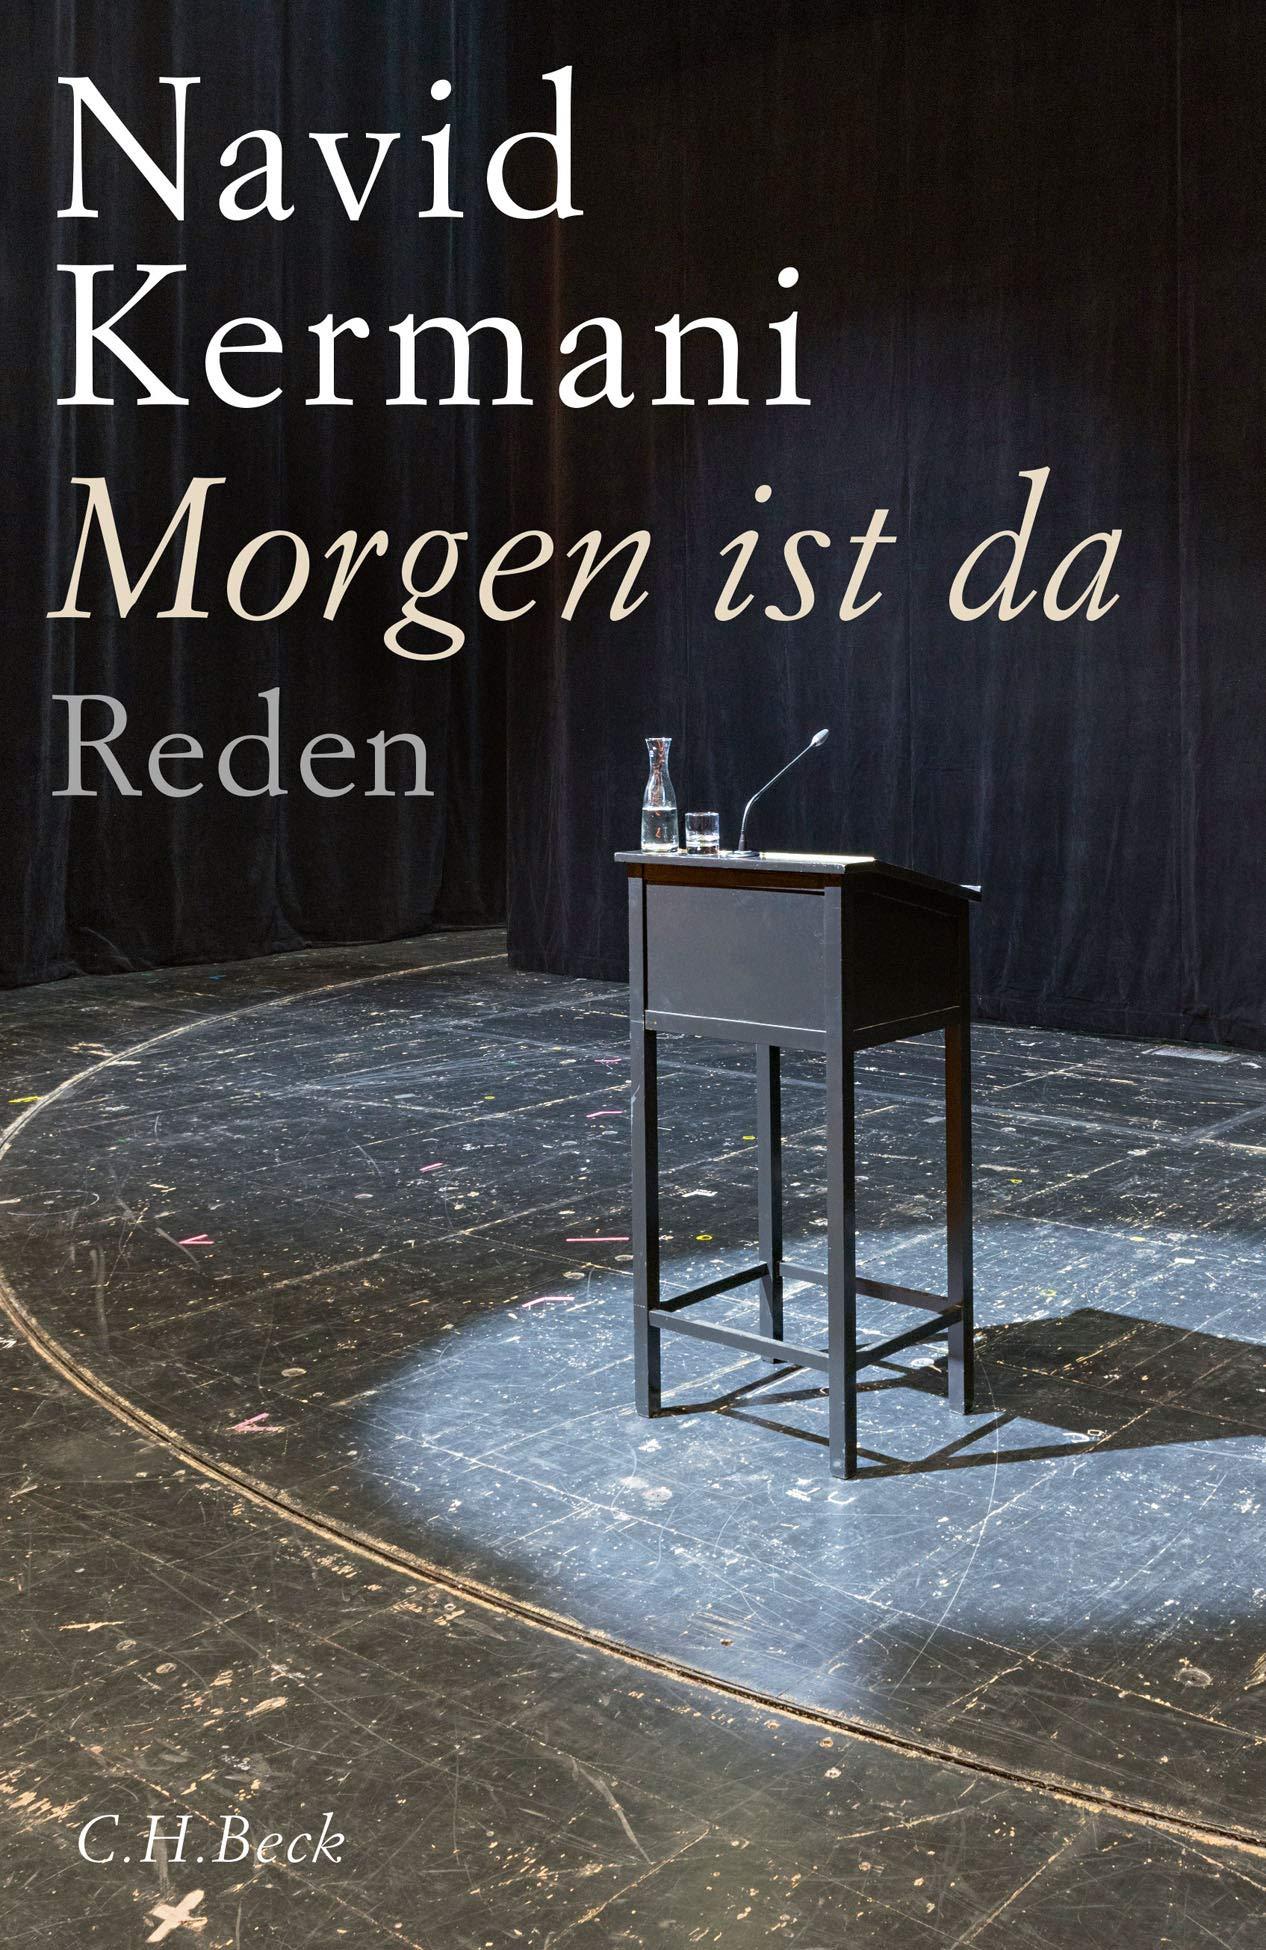 Kermani, Reden